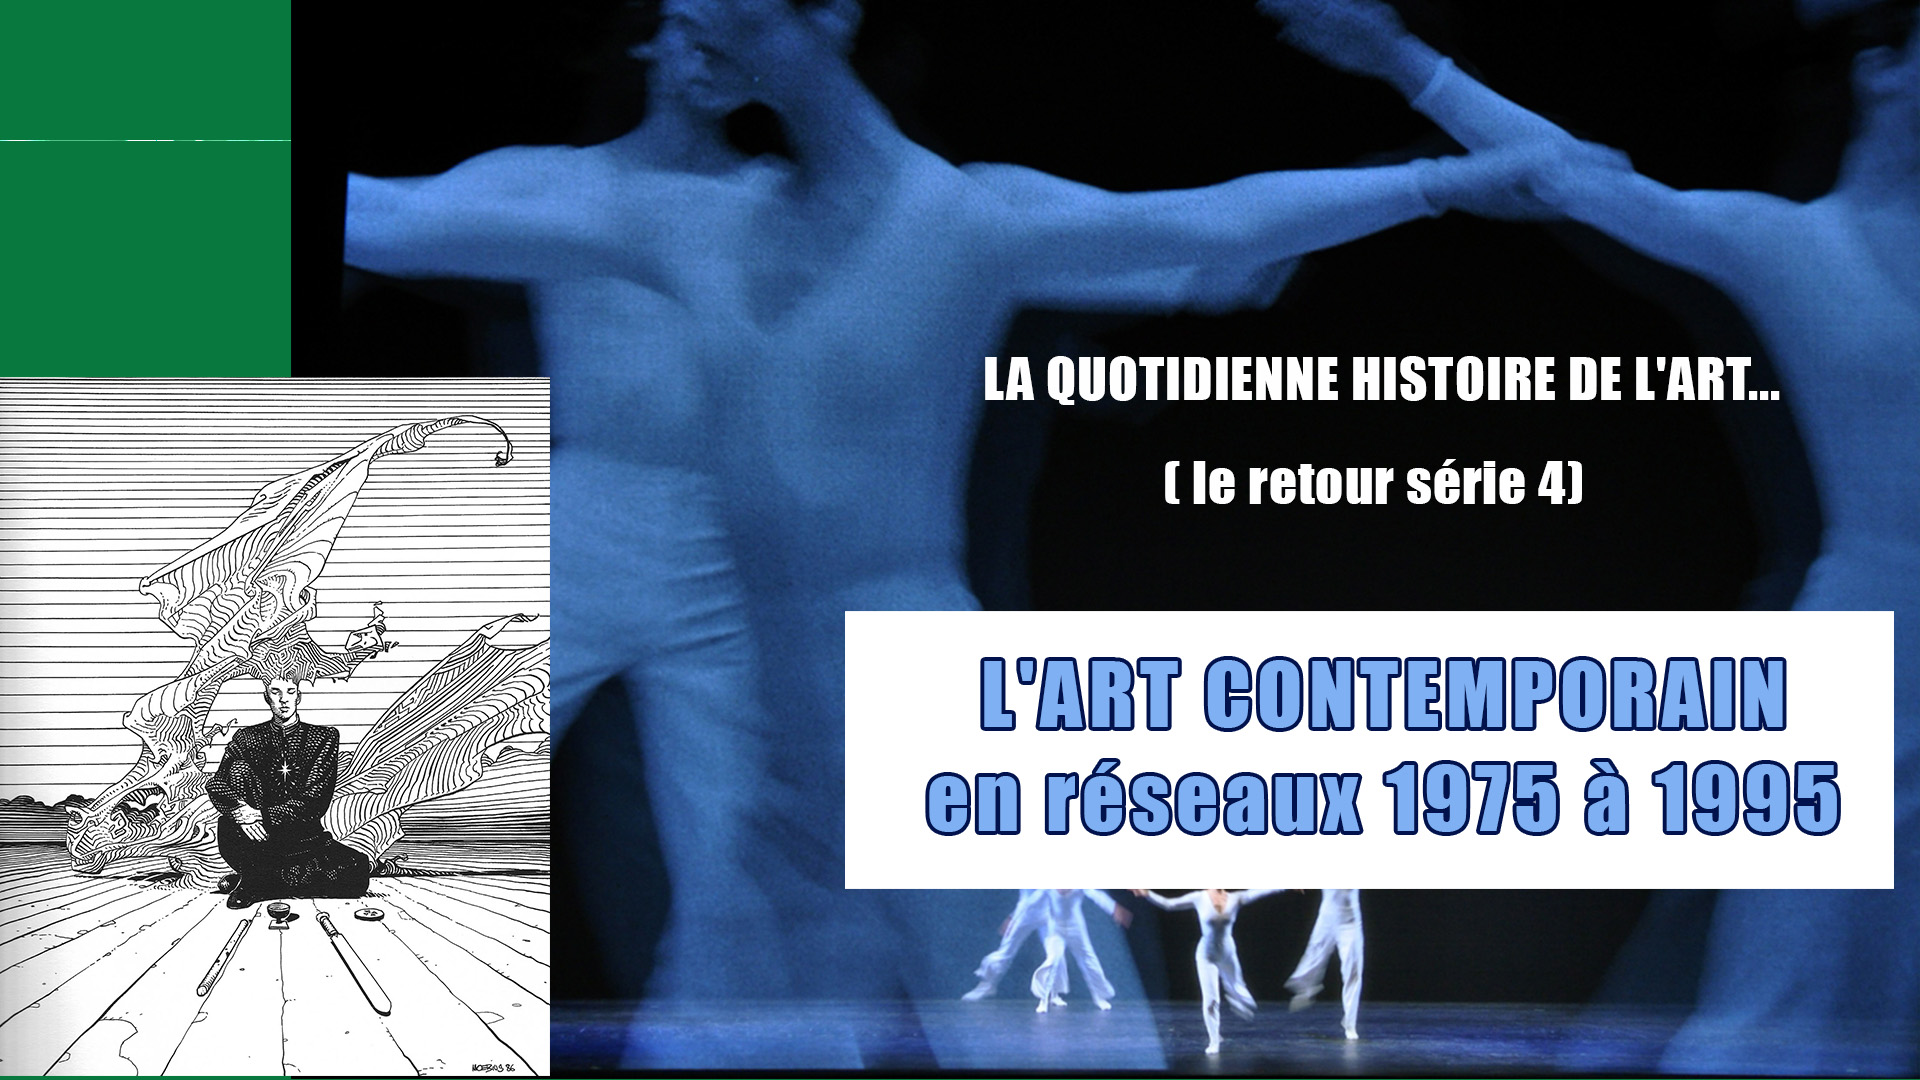 laquotidien HDA-art contemporain-en-reseaux75-95